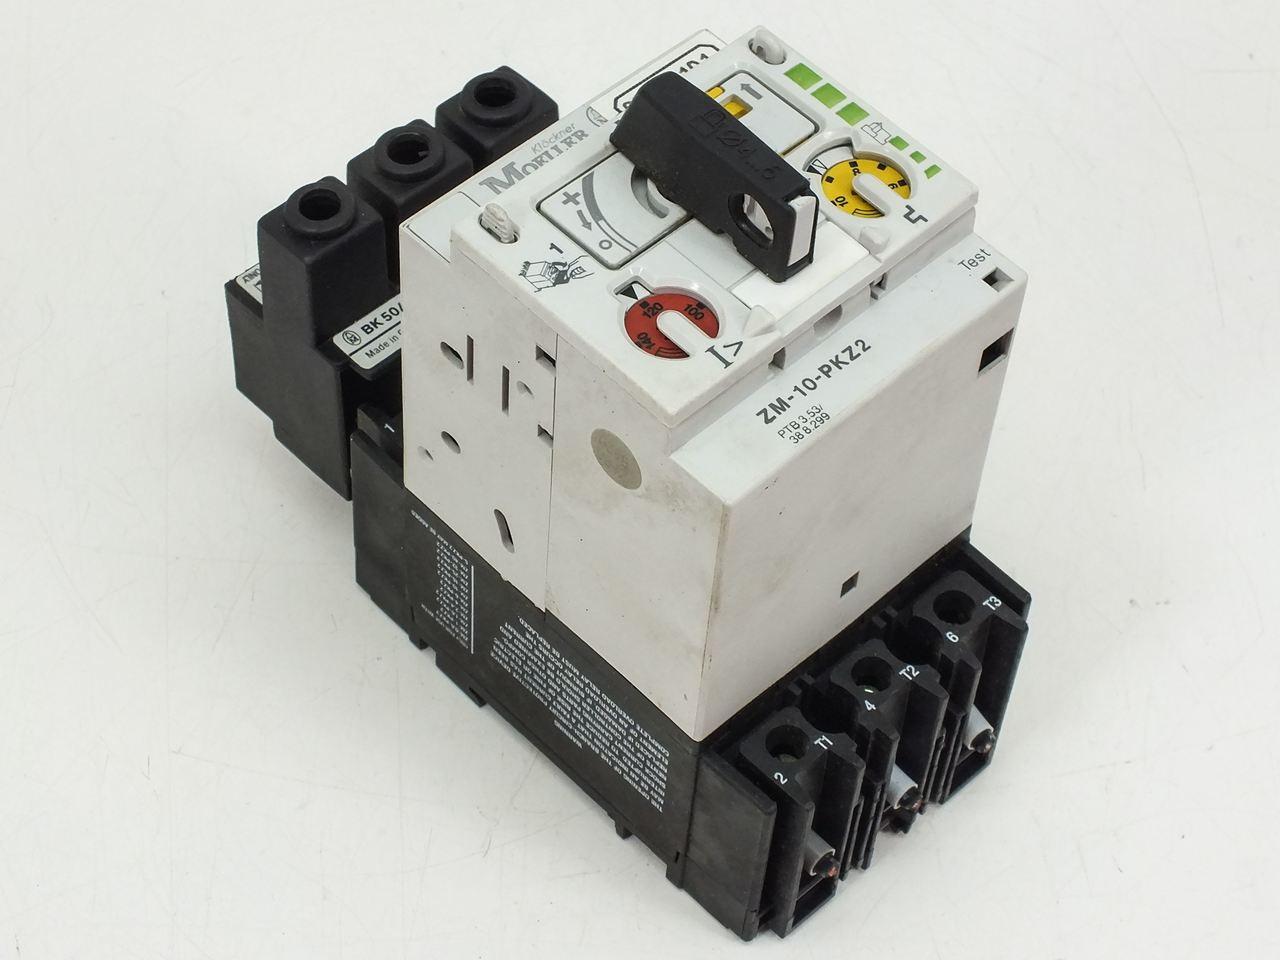 eaton moeller motory starter relay zm 10 pkz2 1.40__20187.1490041836?c=2 moeller pkz 2 control panel wiring diagram moeller wiring  at panicattacktreatment.co